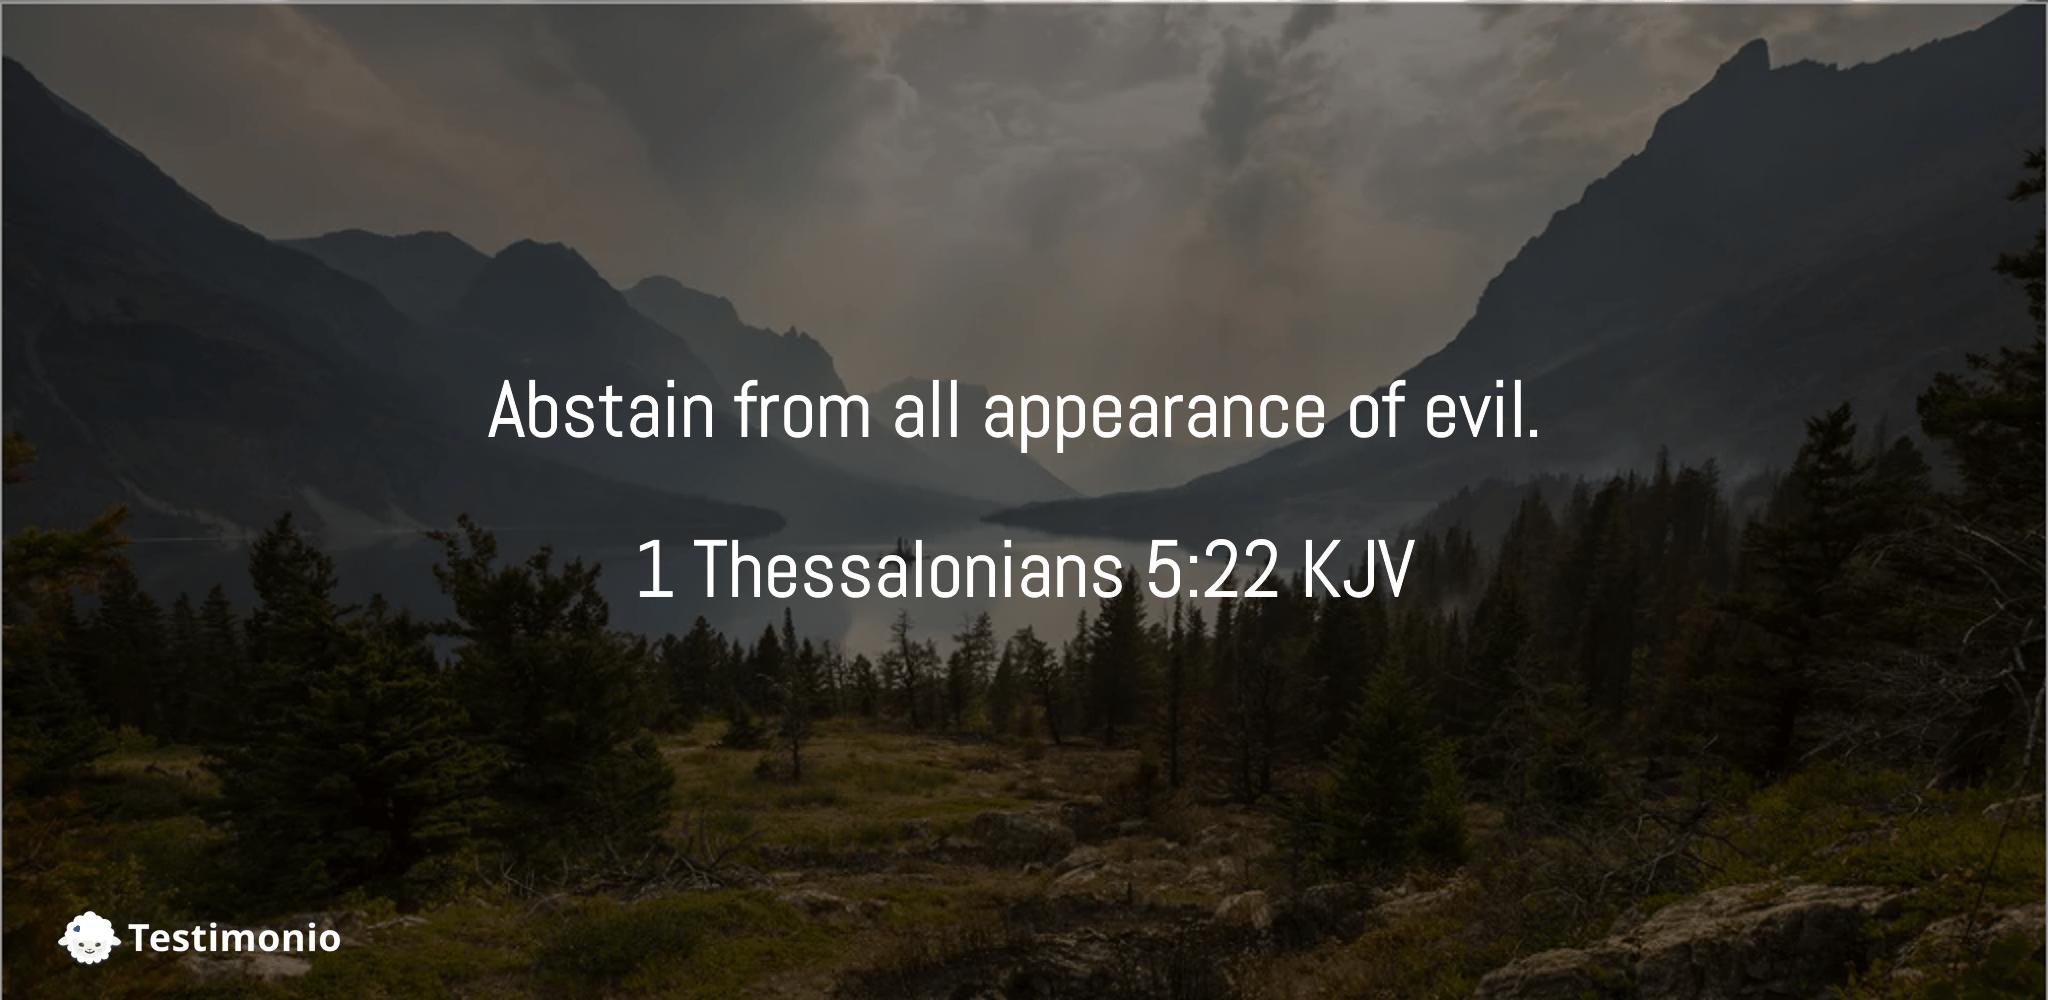 1 Thessalonians 5:22